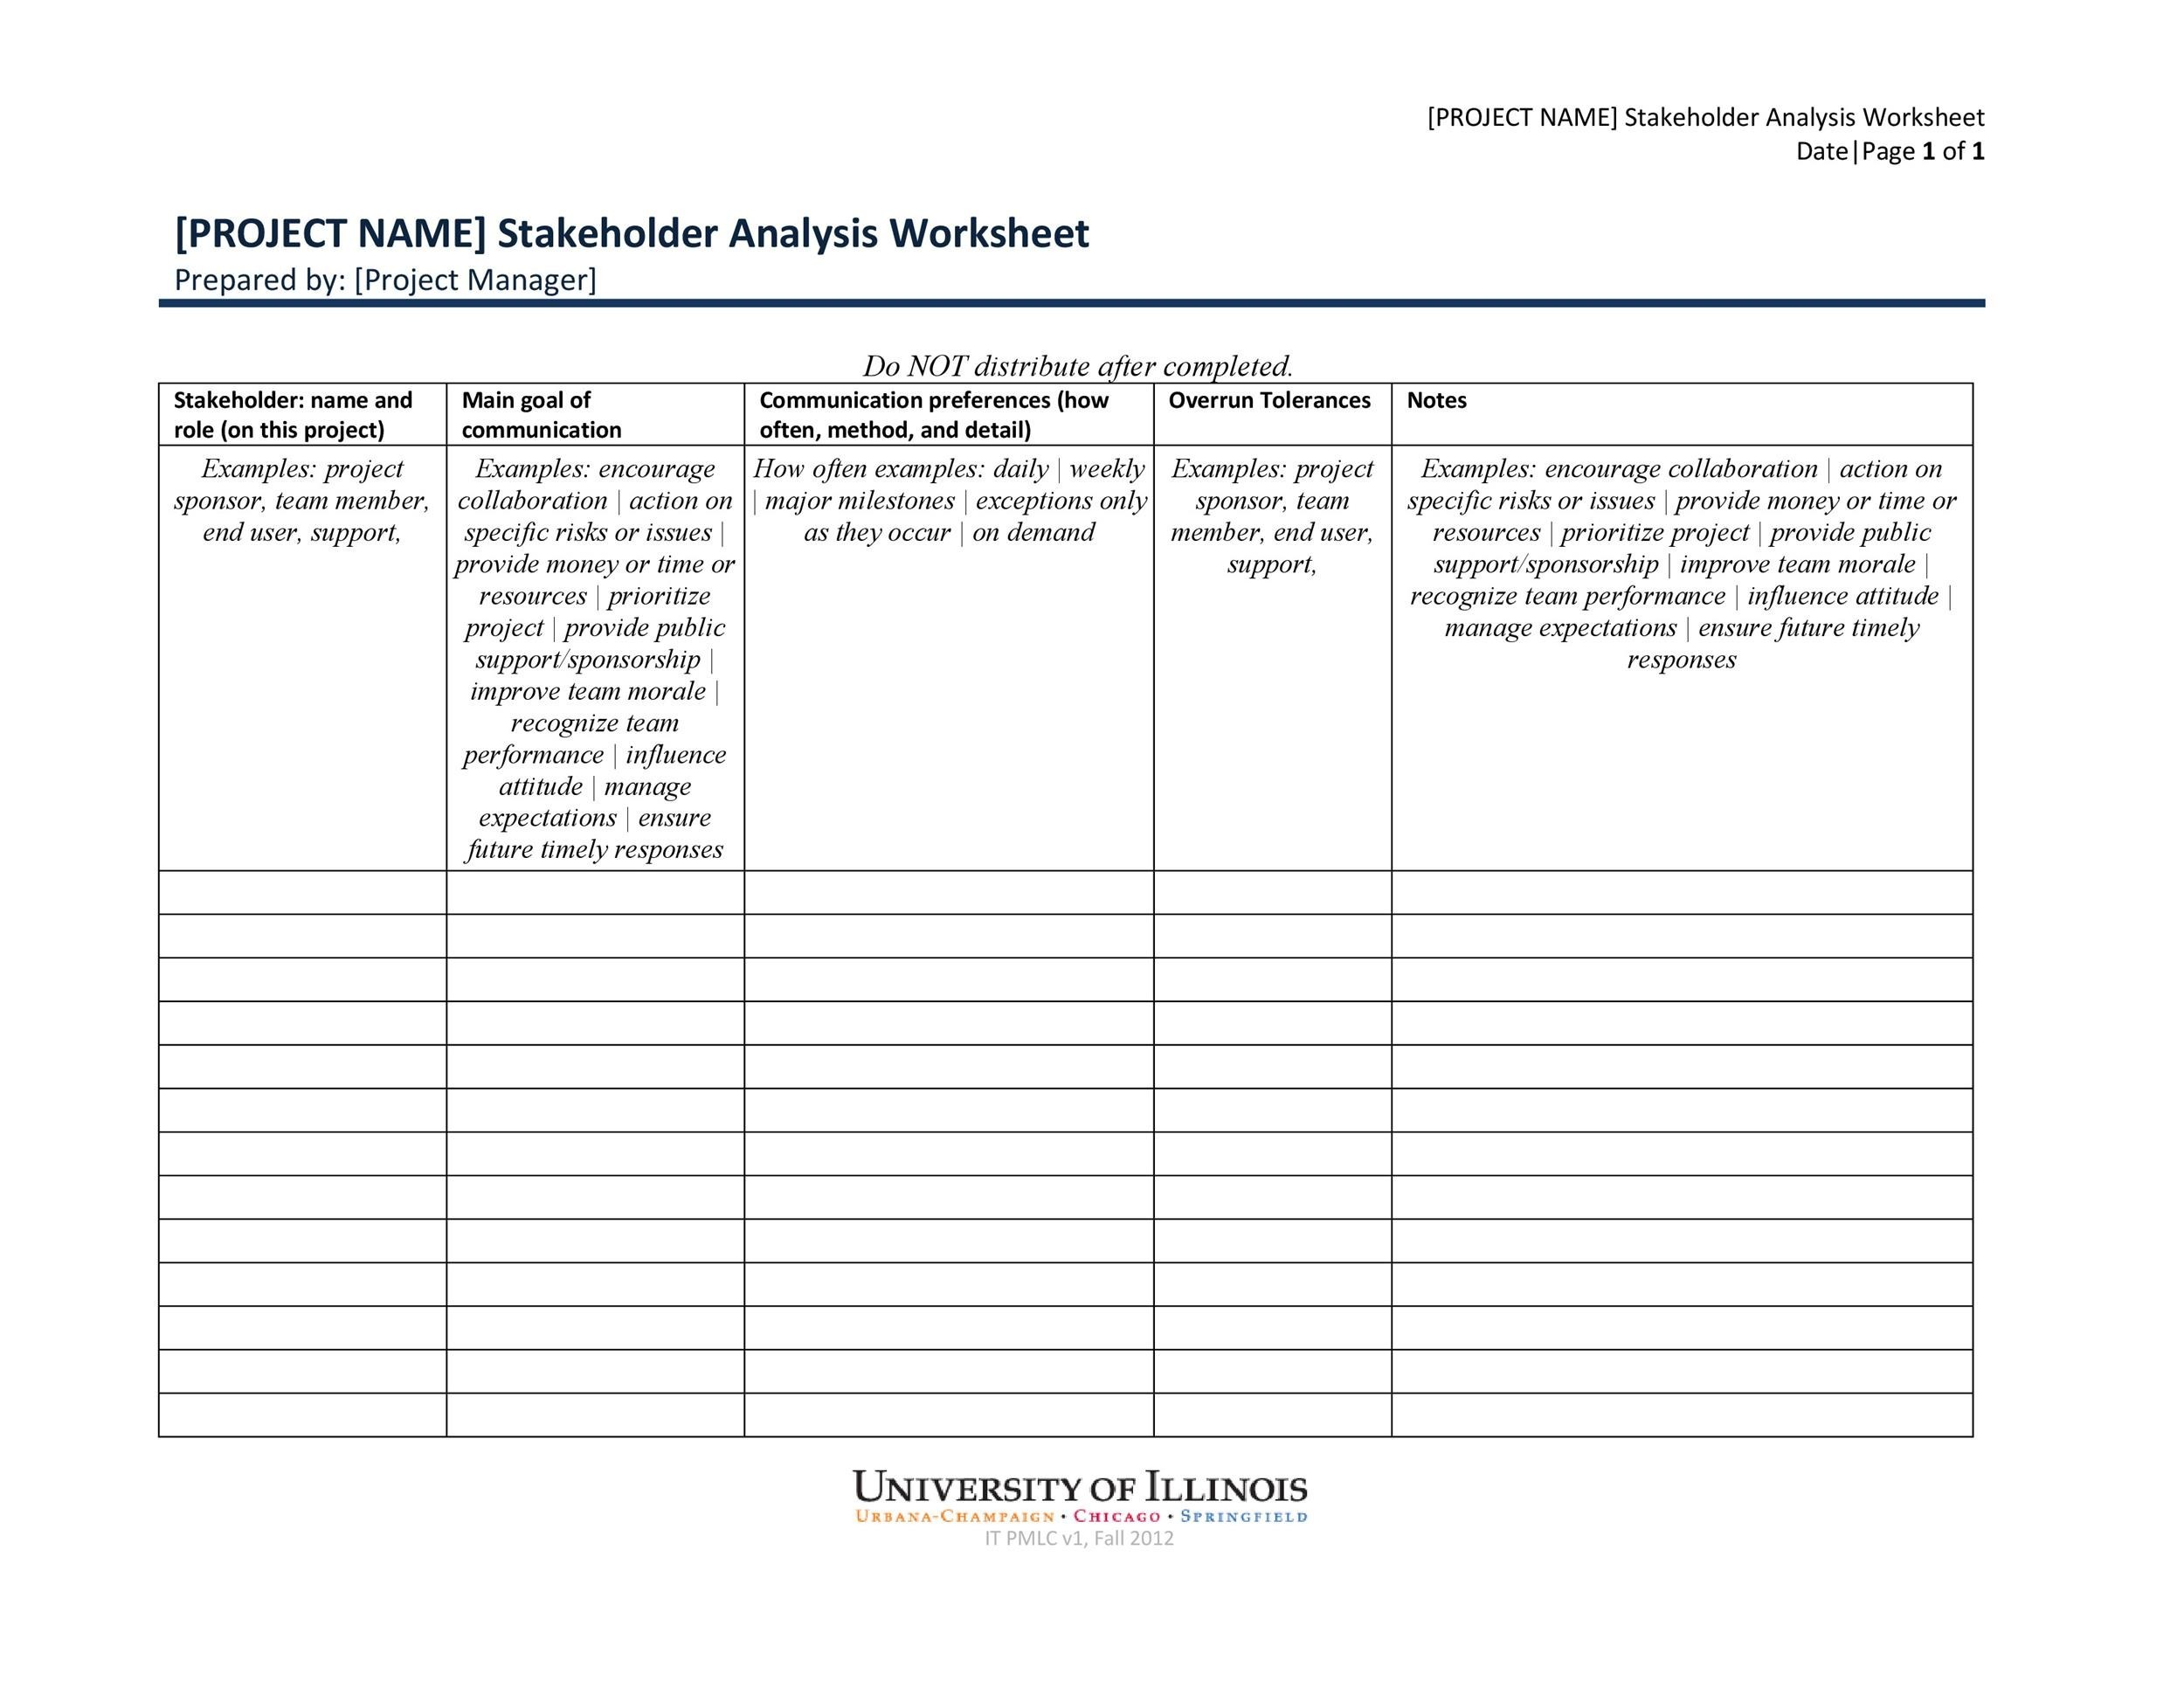 Free stakeholder analysis template 24